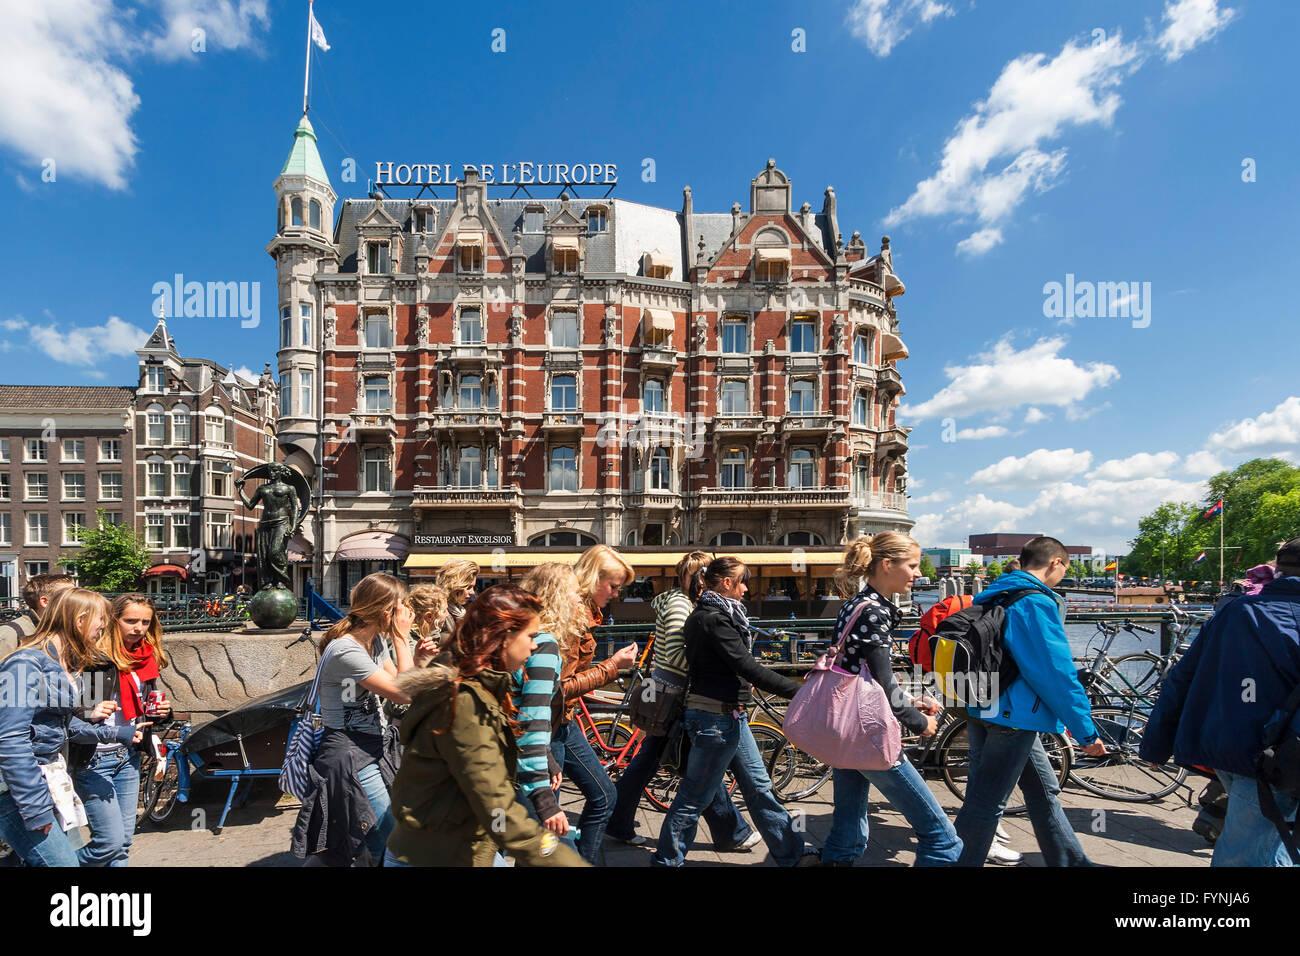 Amsterdam Hotel de l Europe school class Amsterdam, Netherlands - Stock Image